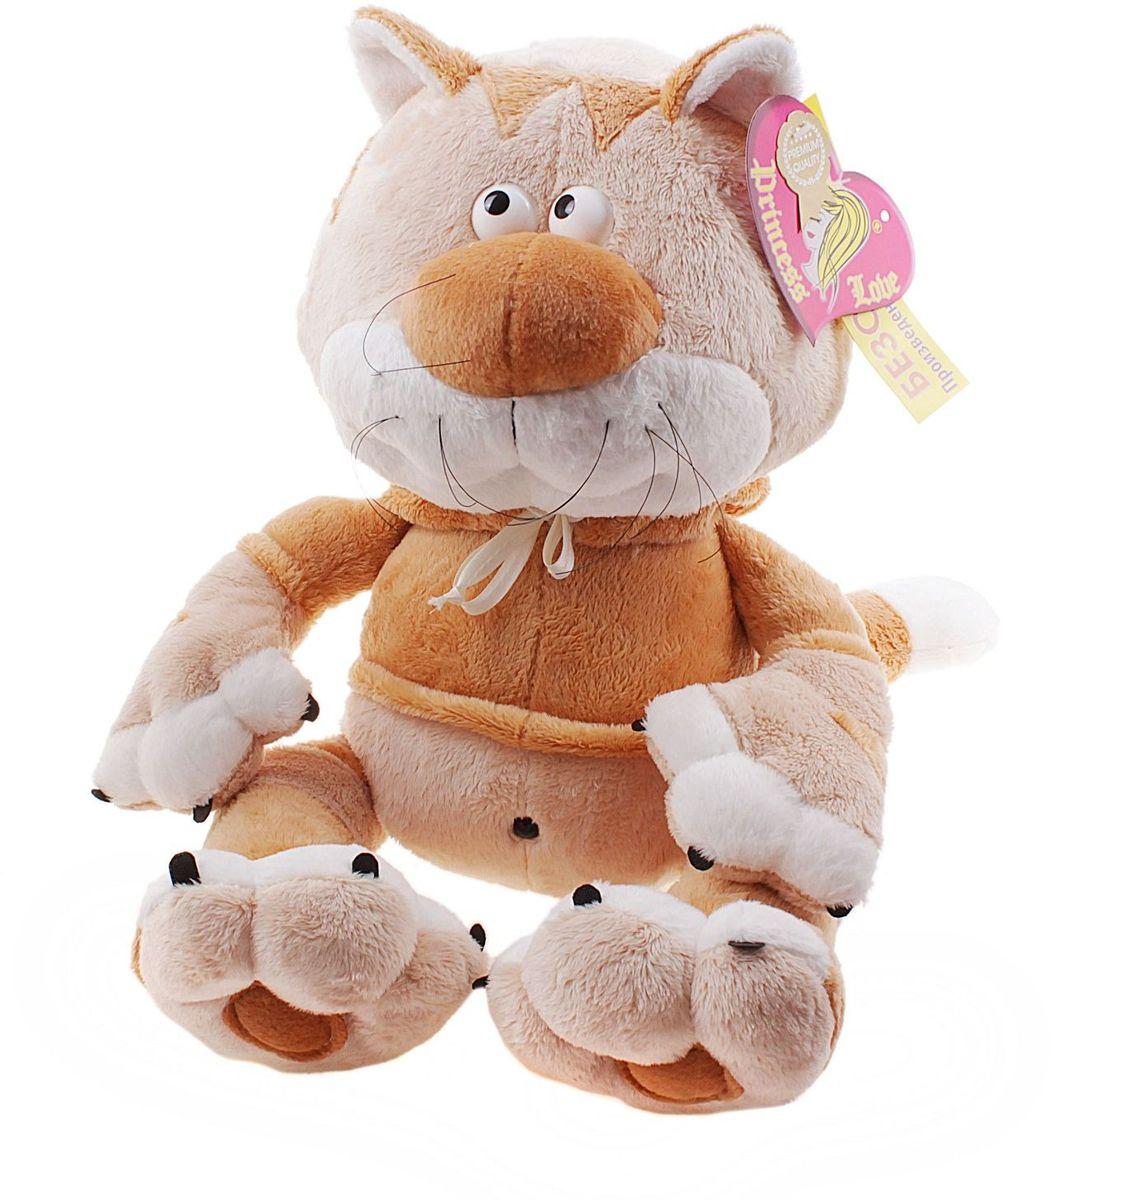 Princess Love Мягкая игрушка Кот Мурзик 50 см 689512